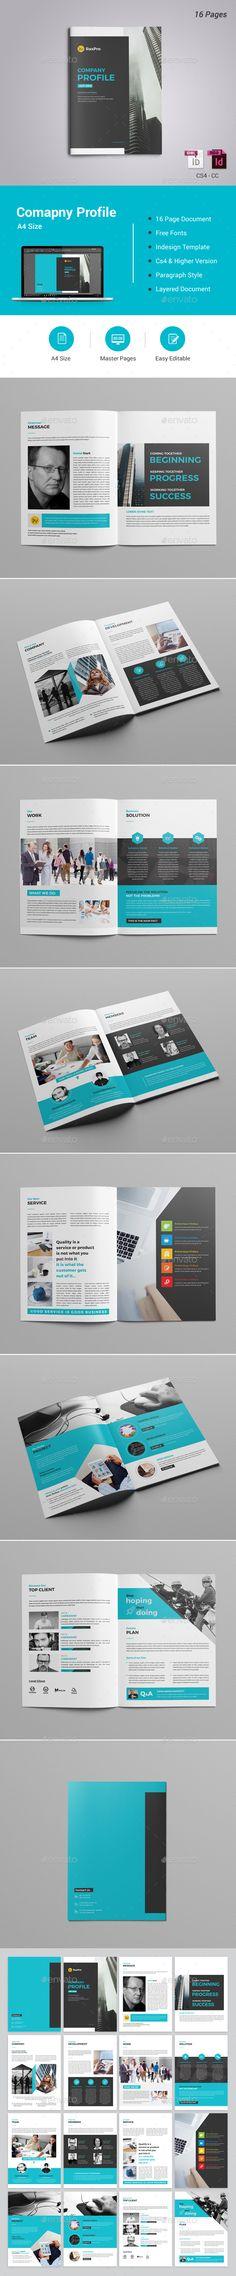 #Company Profile - #Corporate #Brochures Download here:  https://graphicriver.net/item/company-profile/20446986?ref=alena994